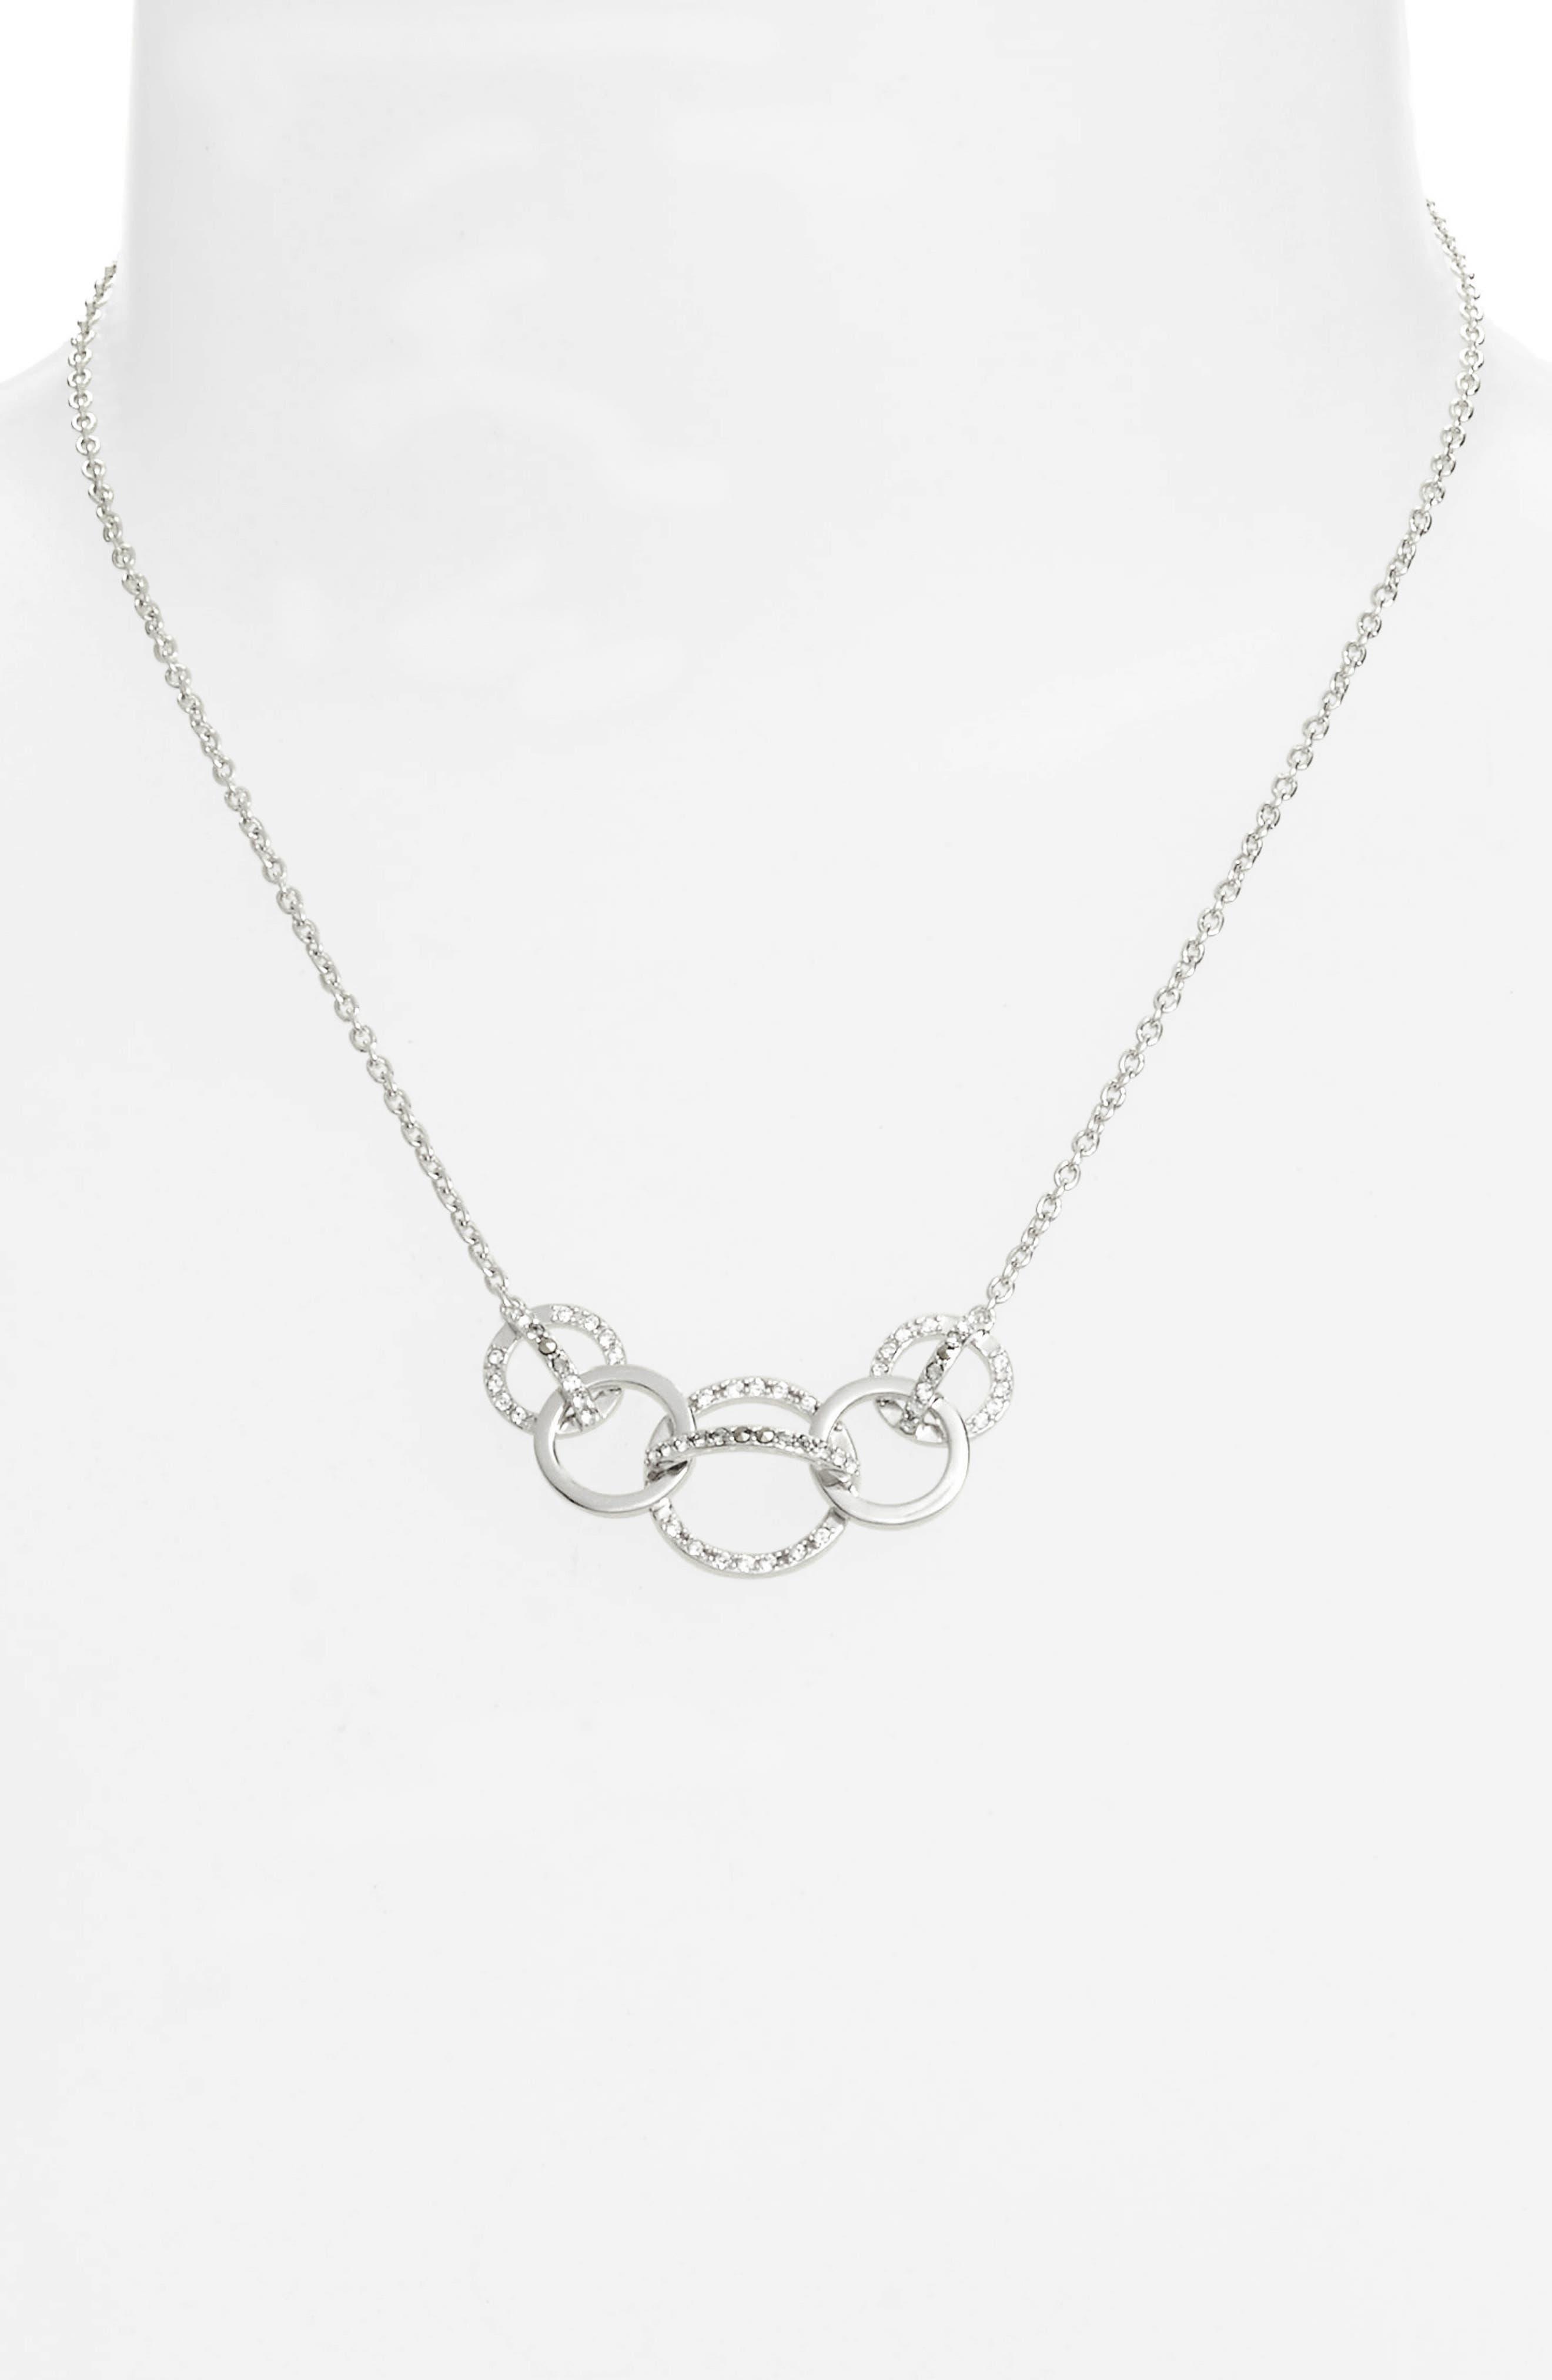 Silver Sparkle Crystal Collar Necklace,                             Alternate thumbnail 2, color,                             Black Diamond/ Marcasite